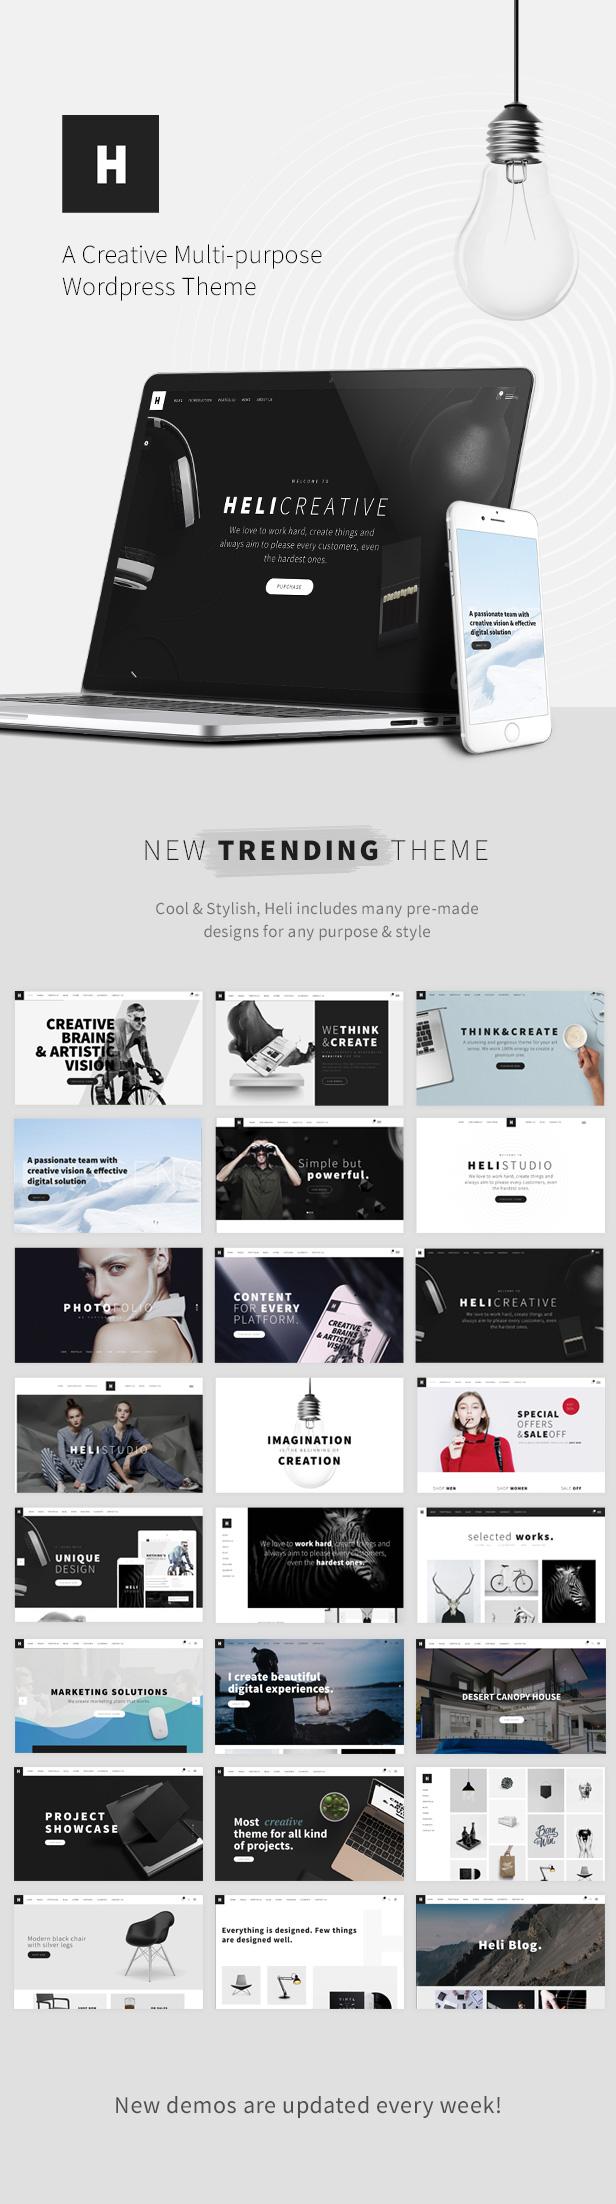 Minimal Creative Black and White WordPress Theme - 40+ multipurpose demo wordpress theme